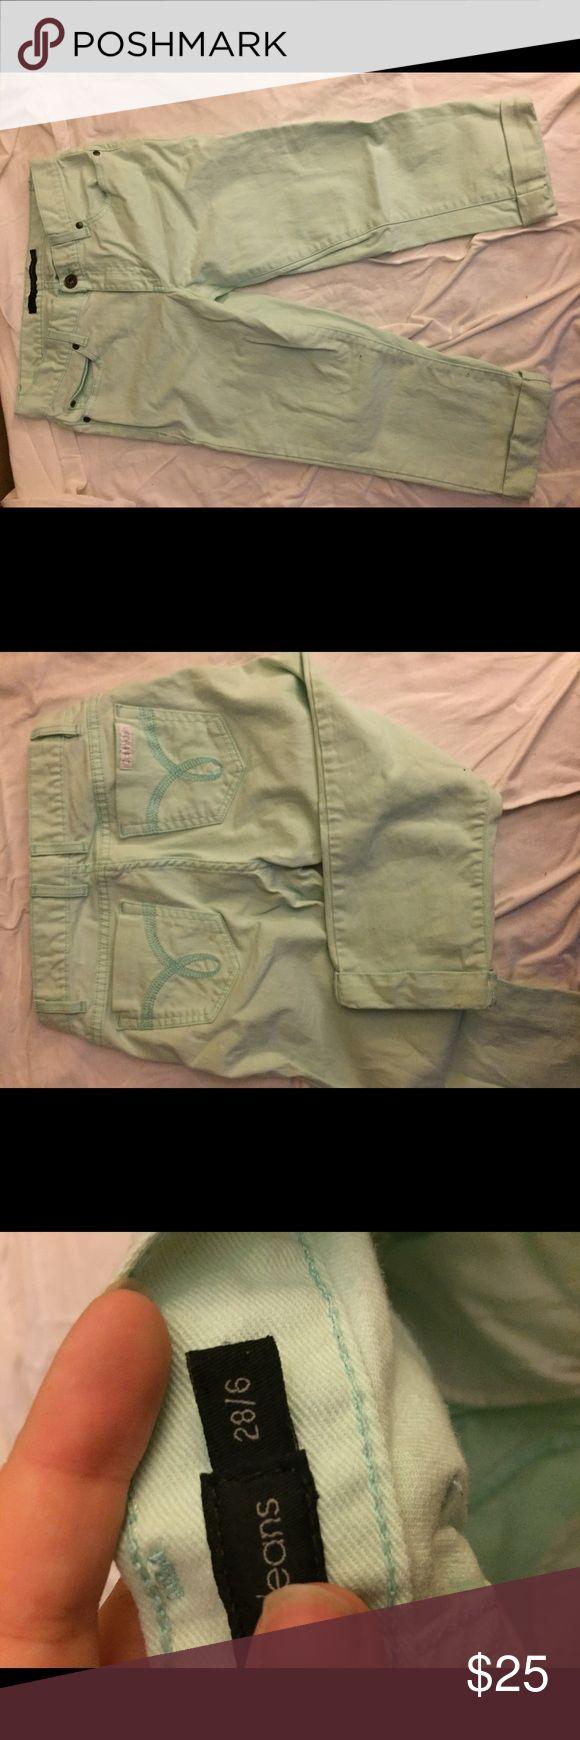 Calvin Klein Mint Capris Cute mint green Ck capris–perfect for dressing up or down! Calvin Klein Pants Capris